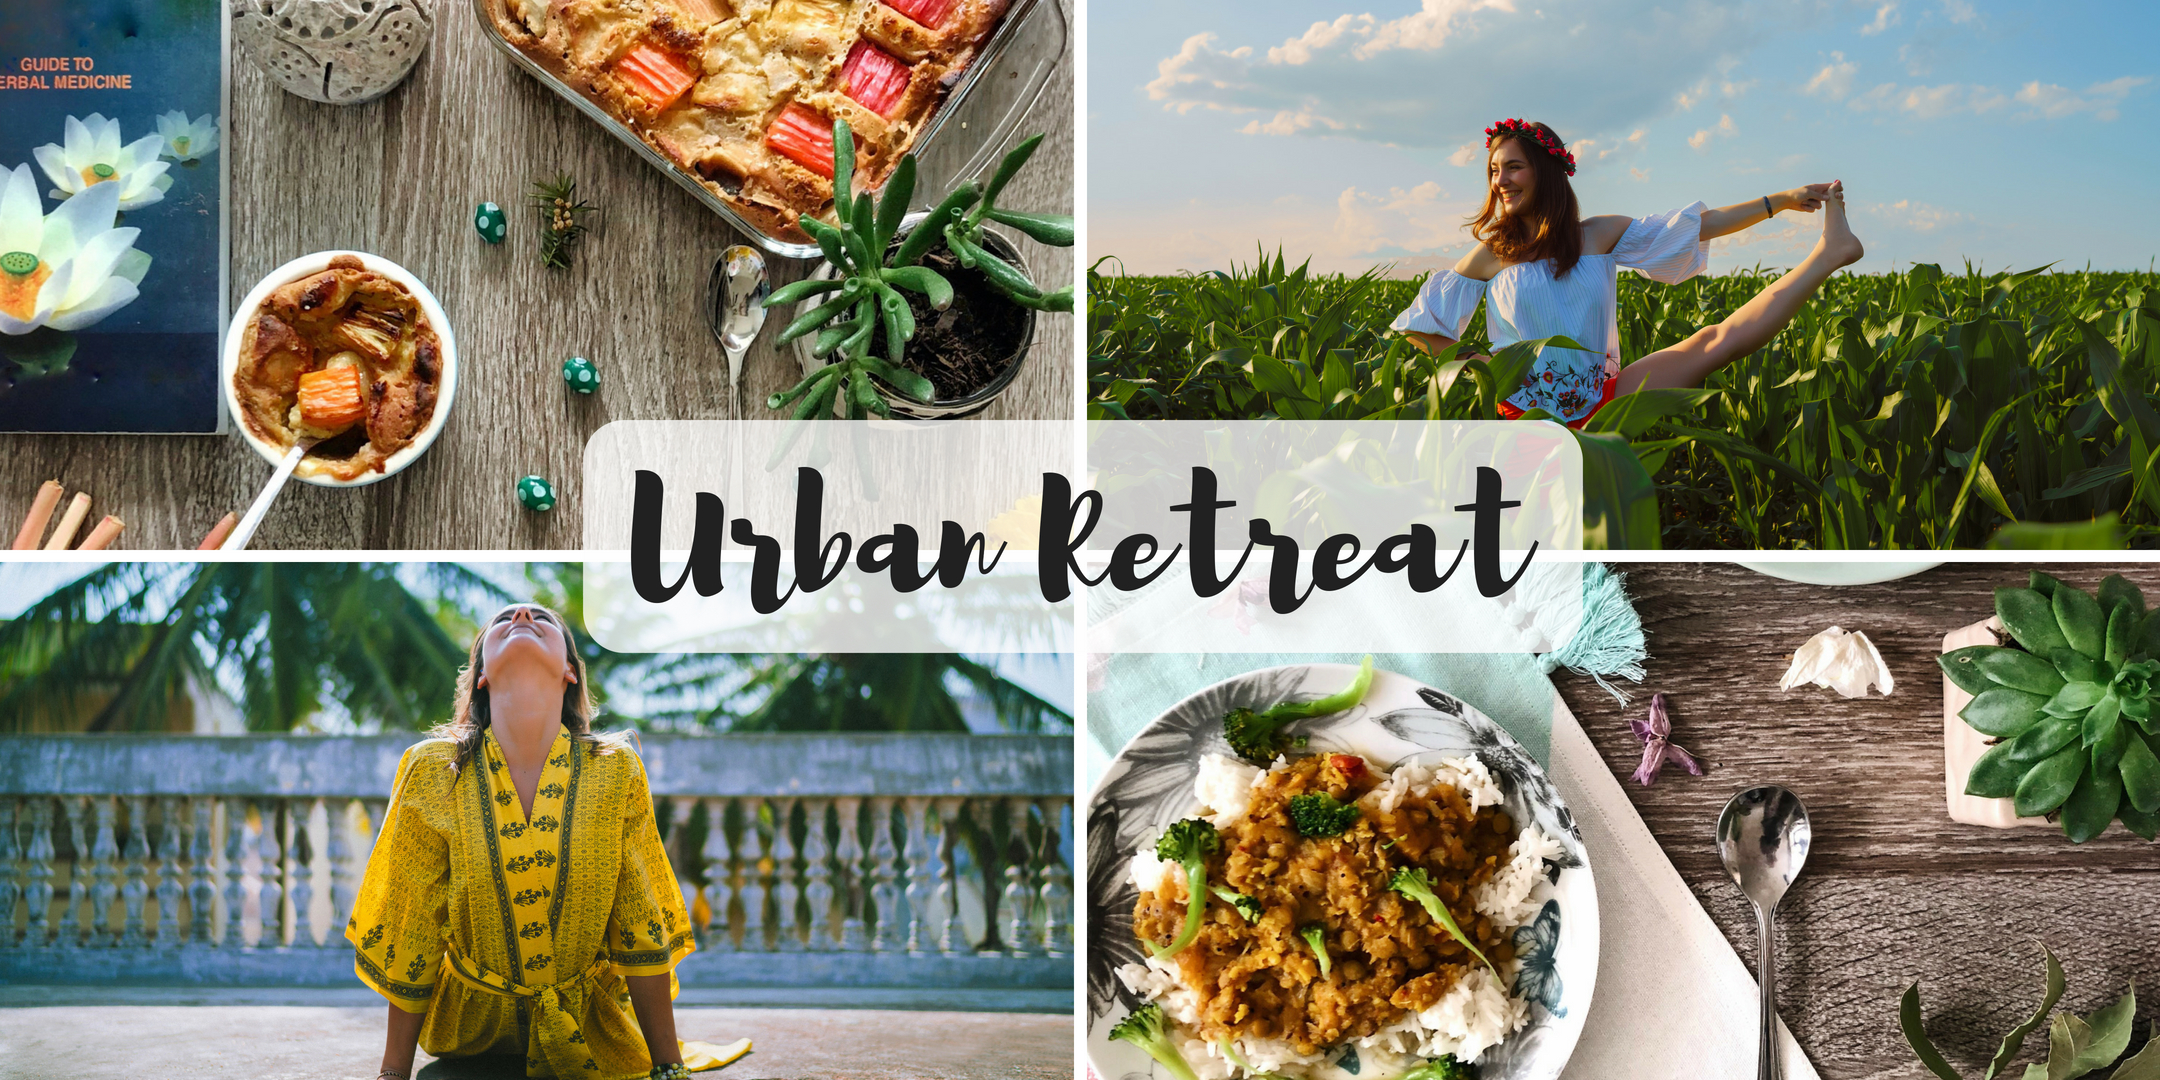 Urban Retreat (1) (1).jpg